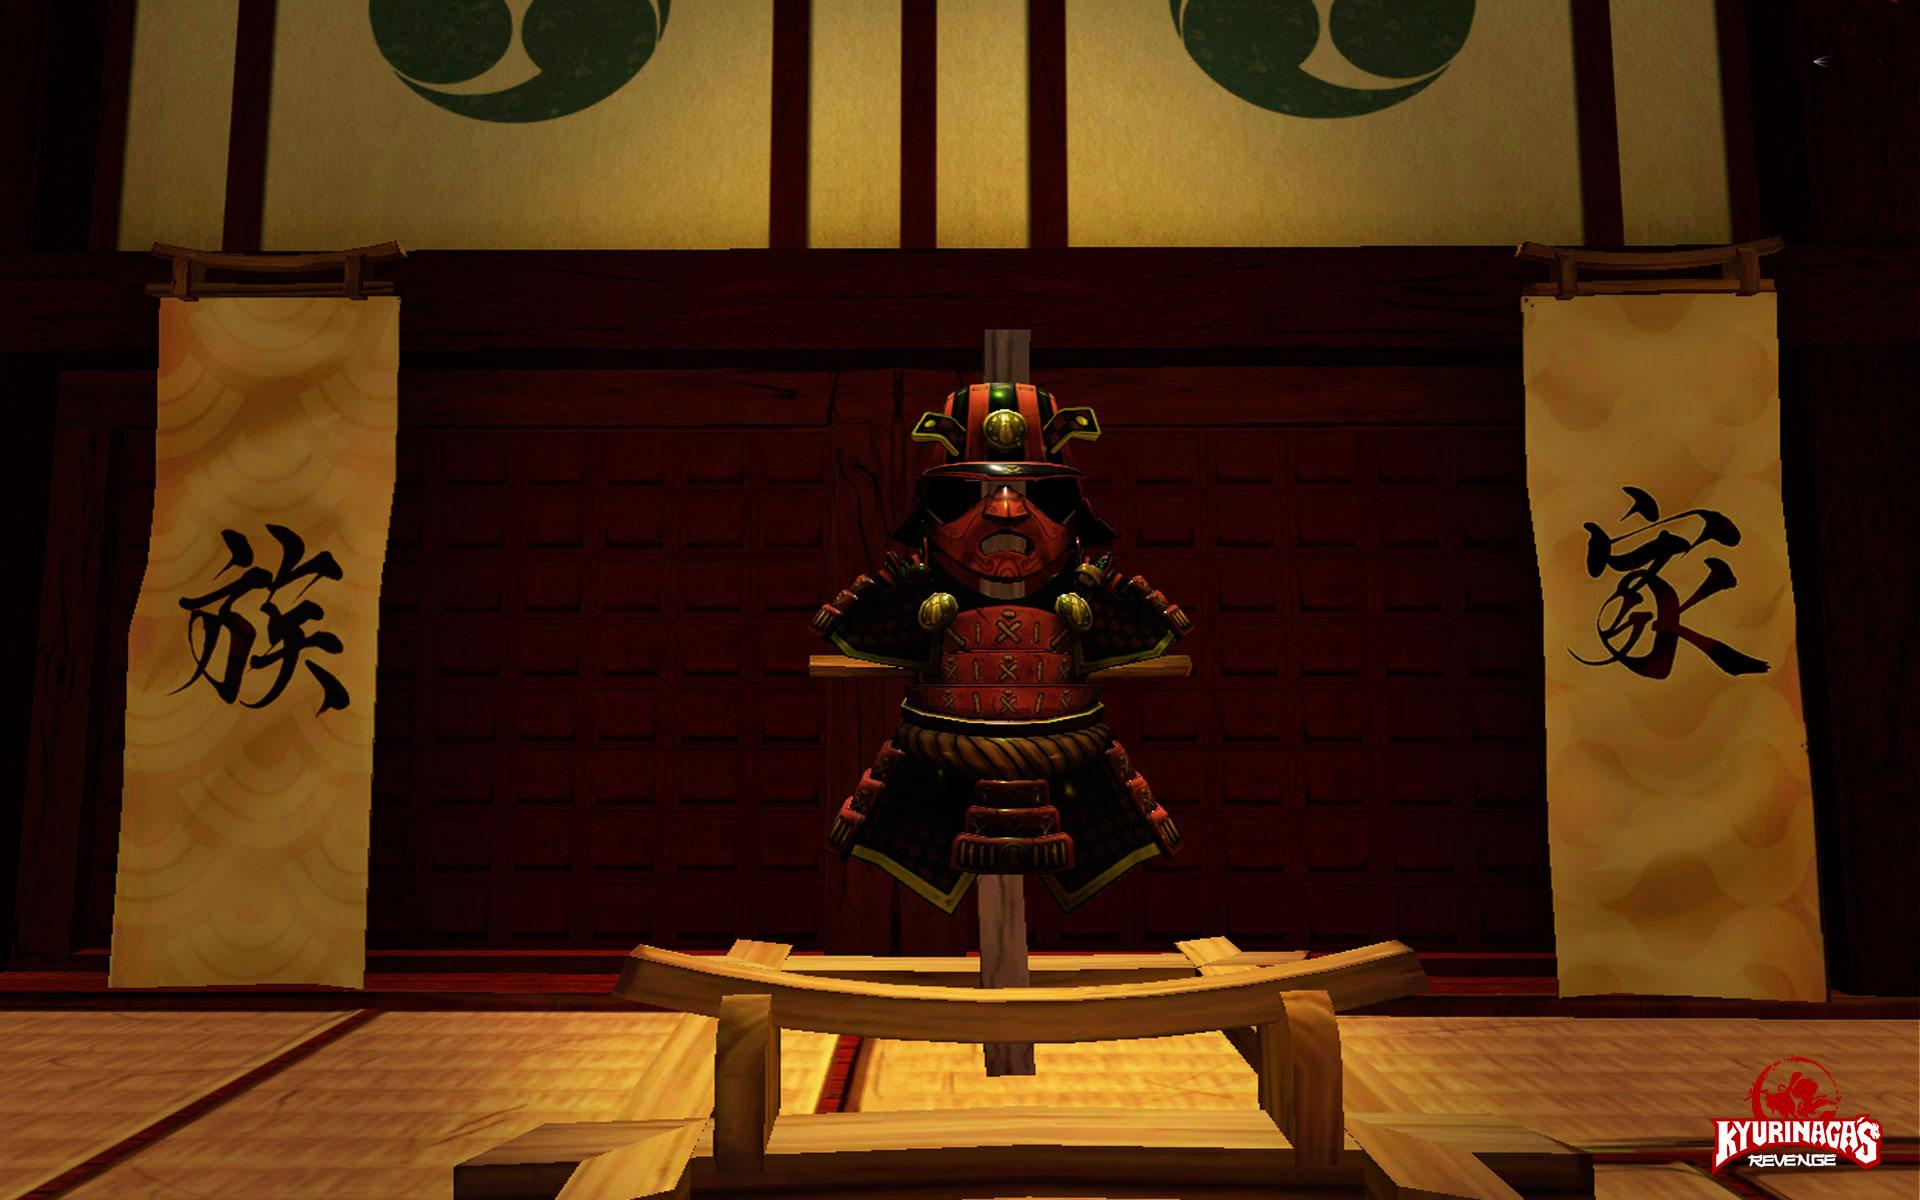 Kyurinaga's Revenge armadura